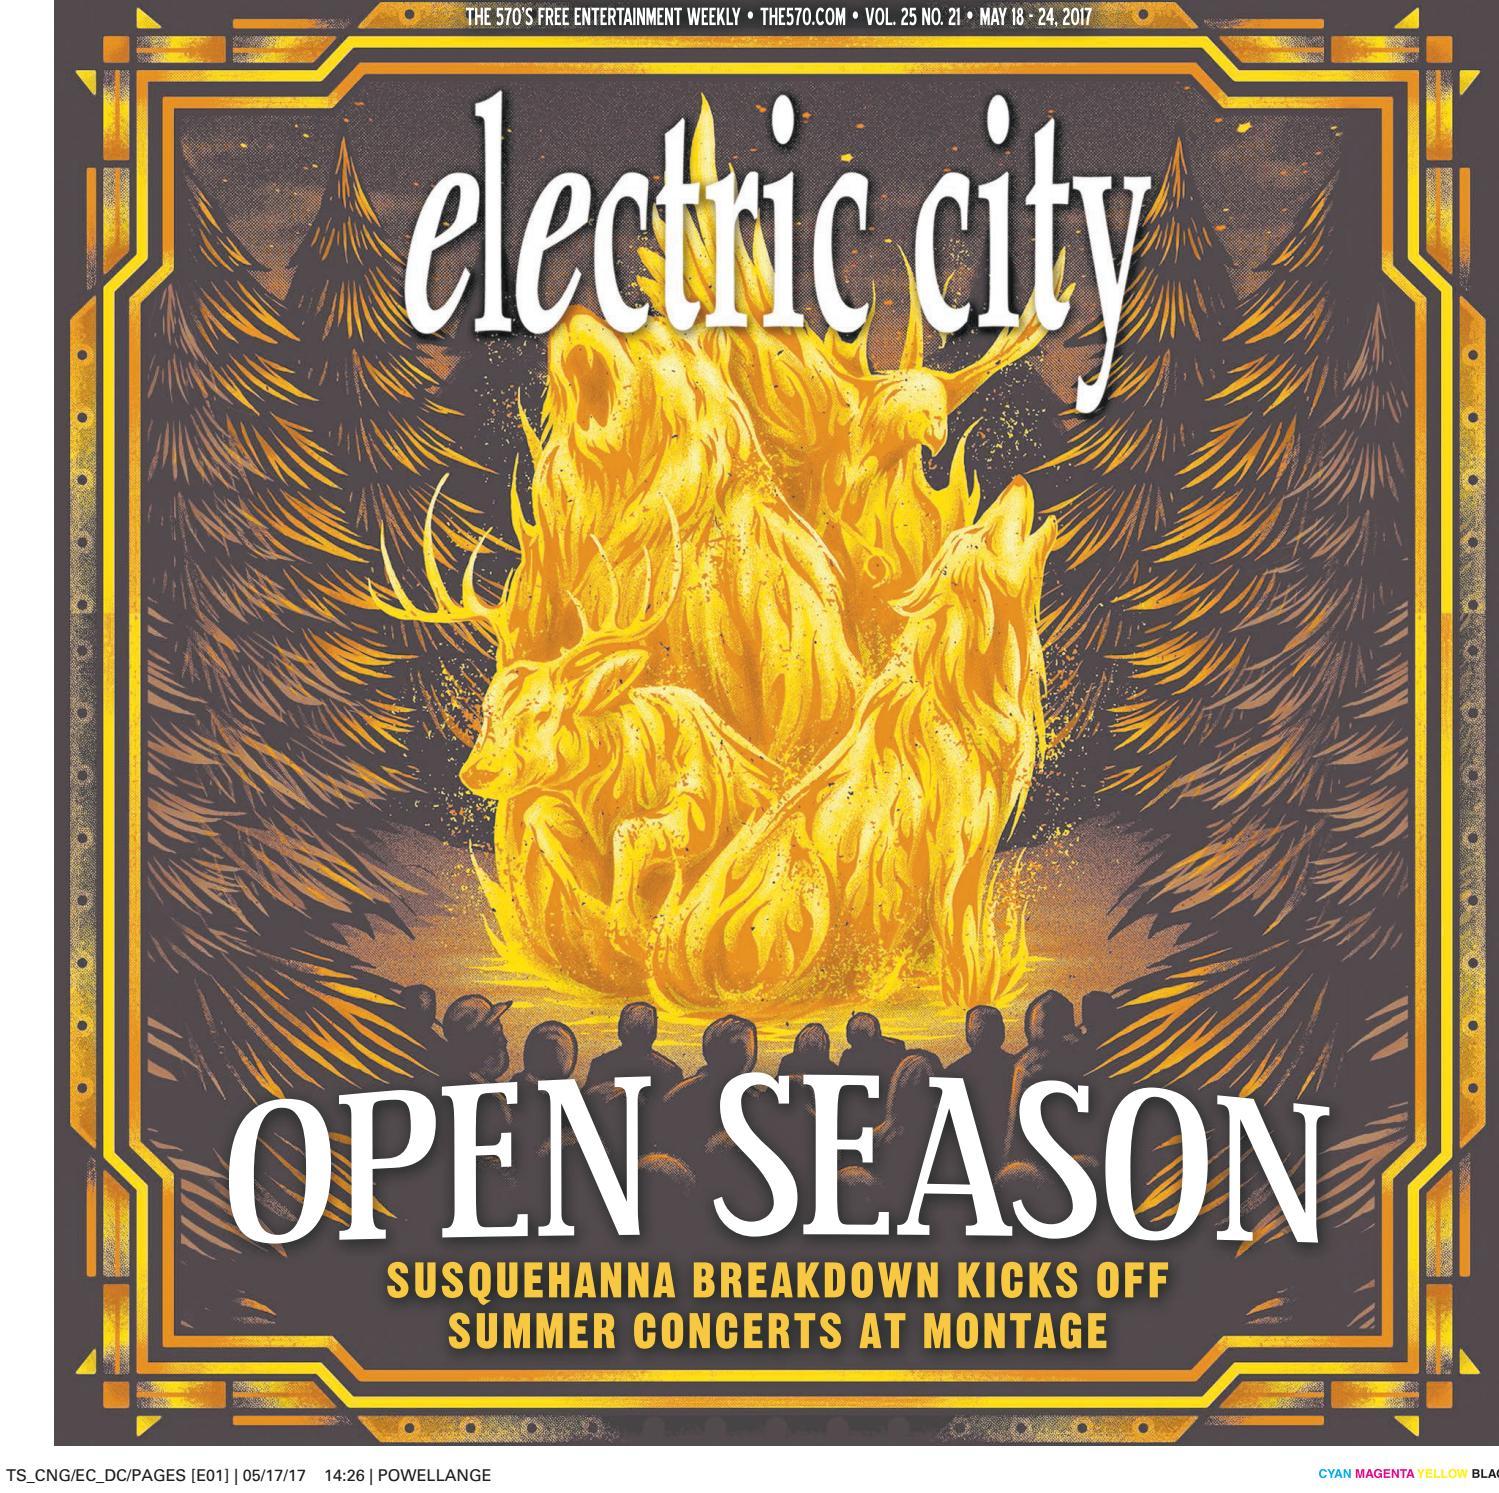 electric city - May 18 184550b9f